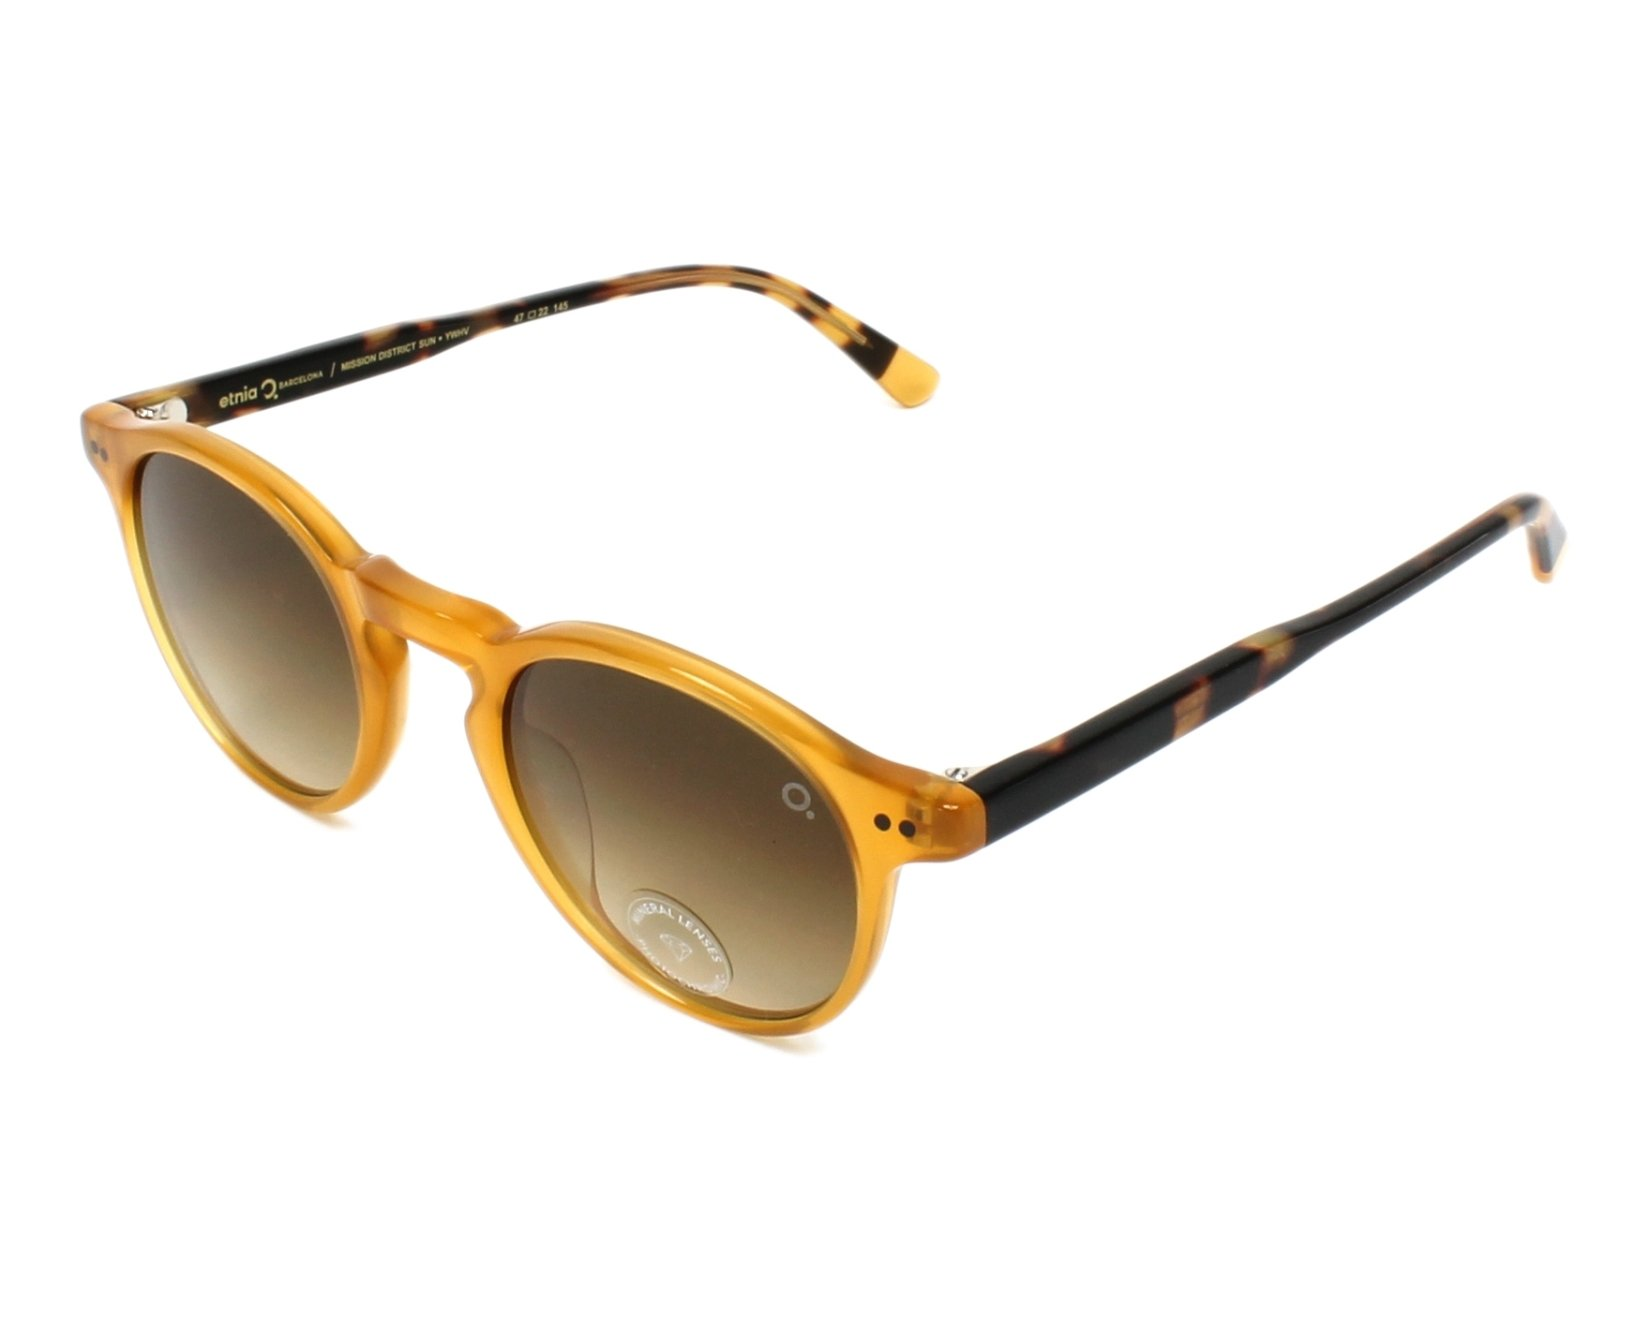 9d8c60aef94 Sunglasses Etnia Barcelona MISSIONDISTRICT YWHV 47-22 Yellow Havana profile  view